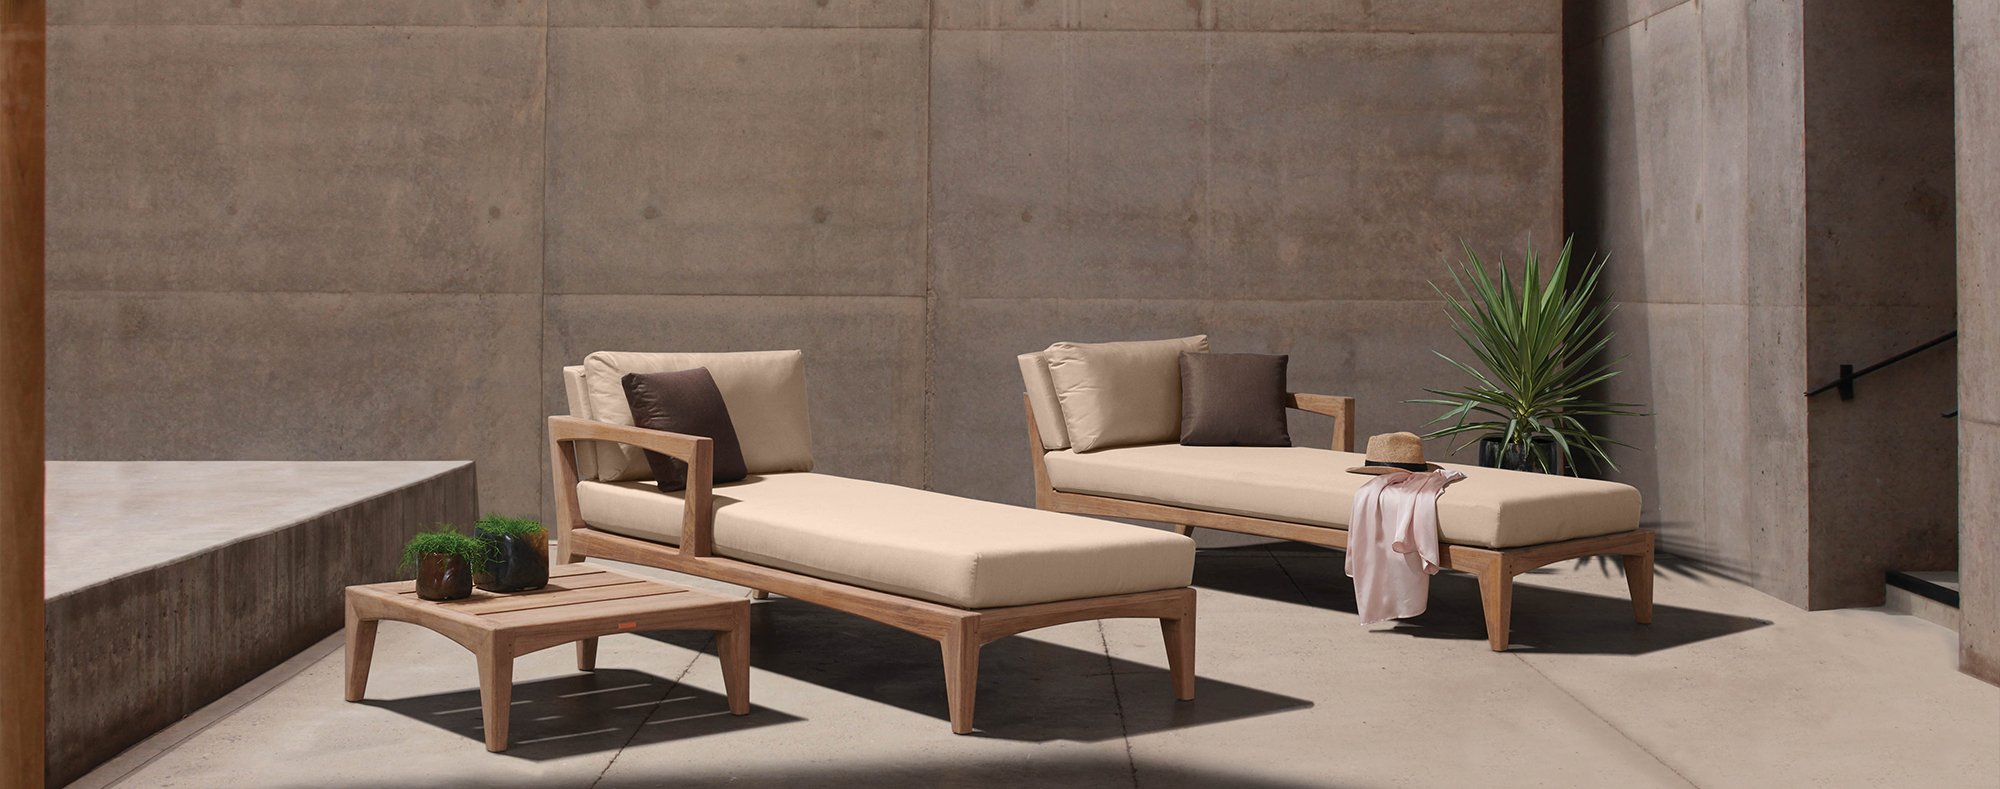 Zenhit luxury outdoor daybed set